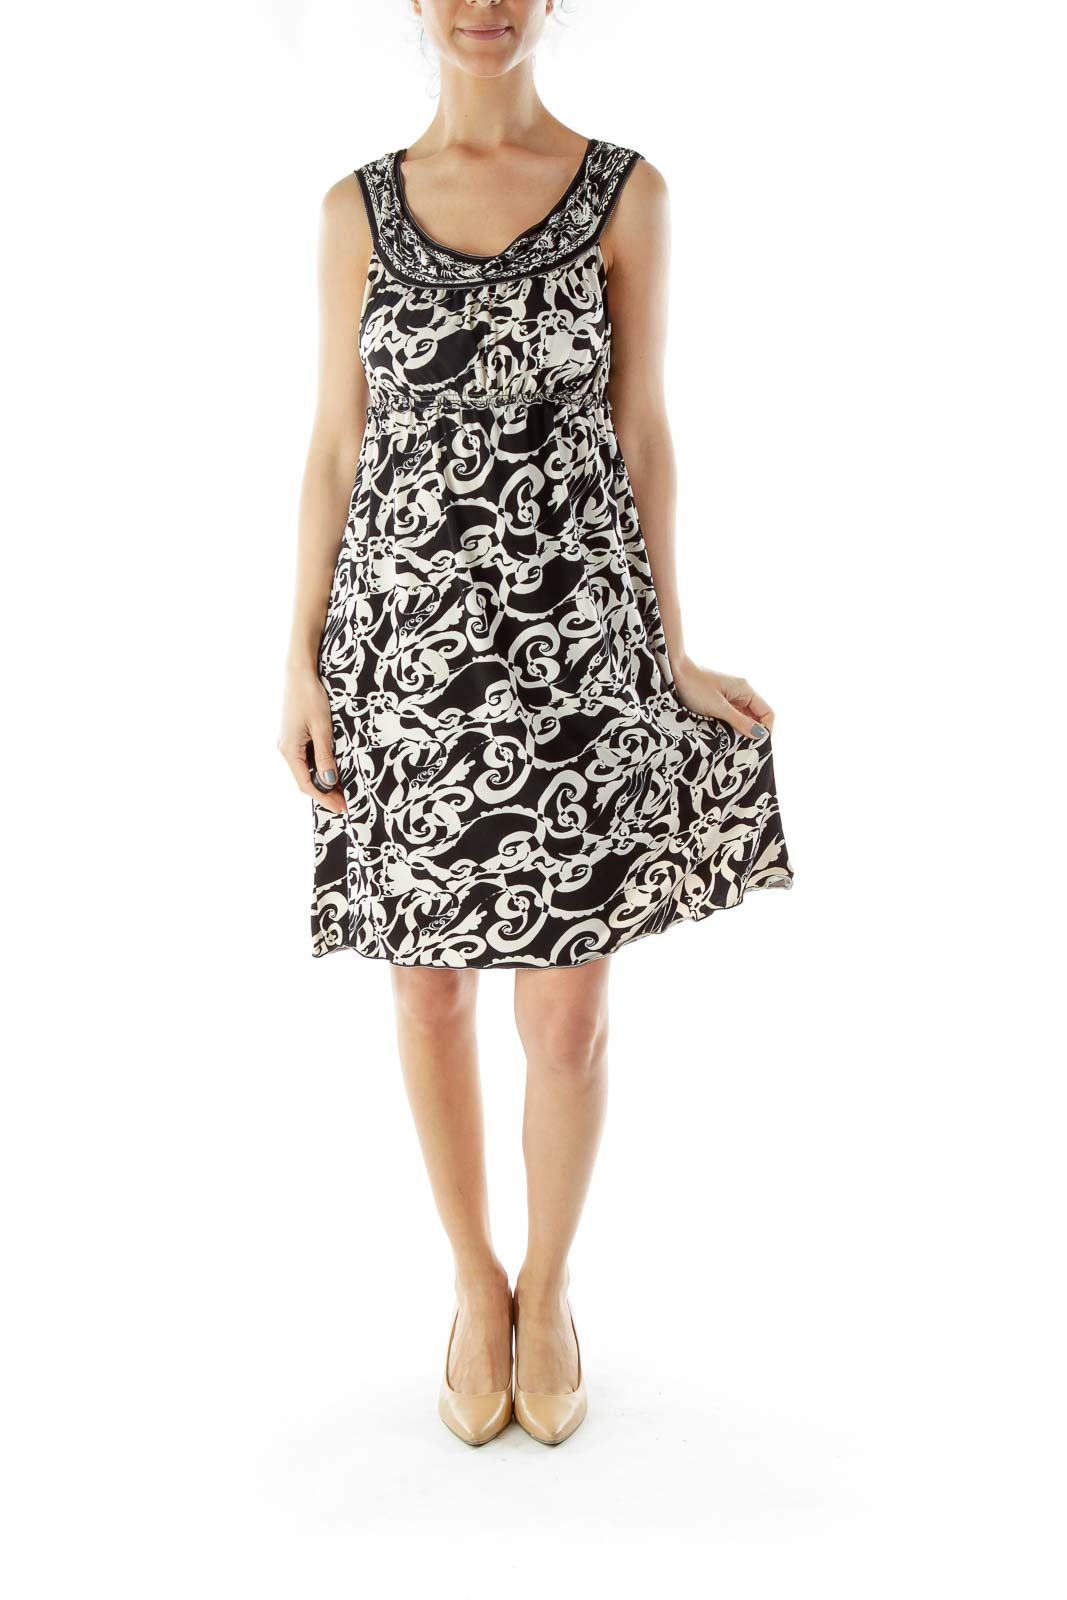 Black White Print Dress with Boat Neckline